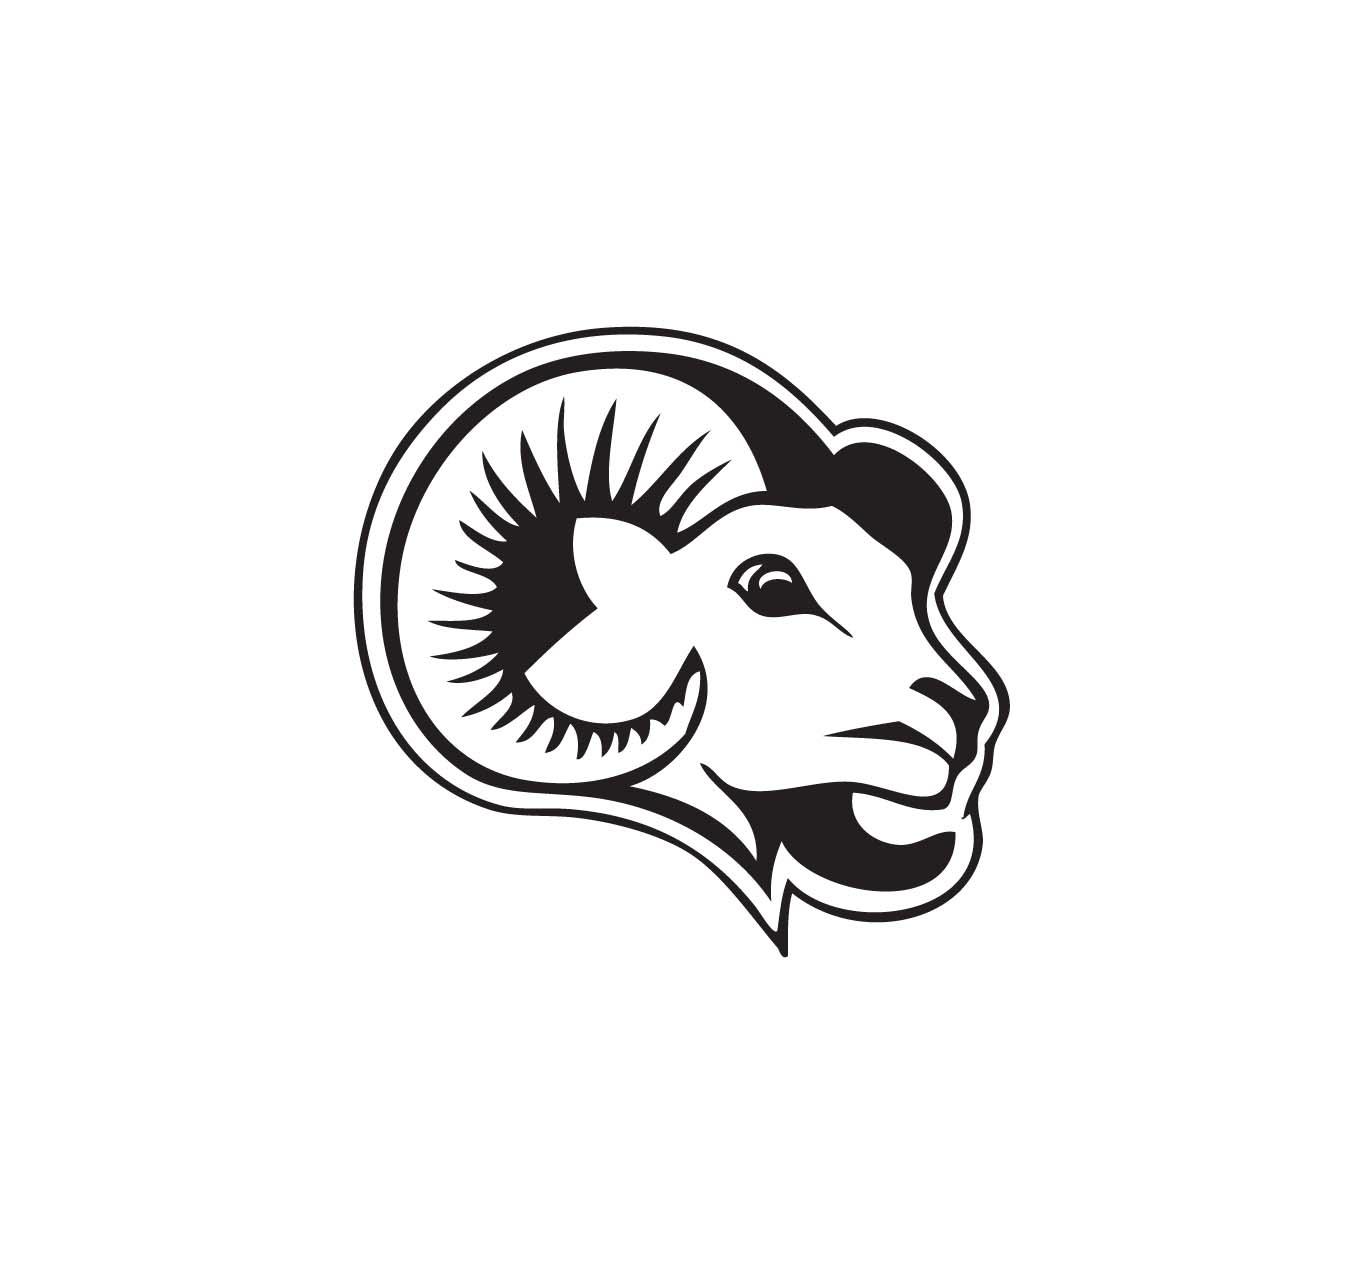 Ram Mascot Clipart-Ram Mascot Clipart-18